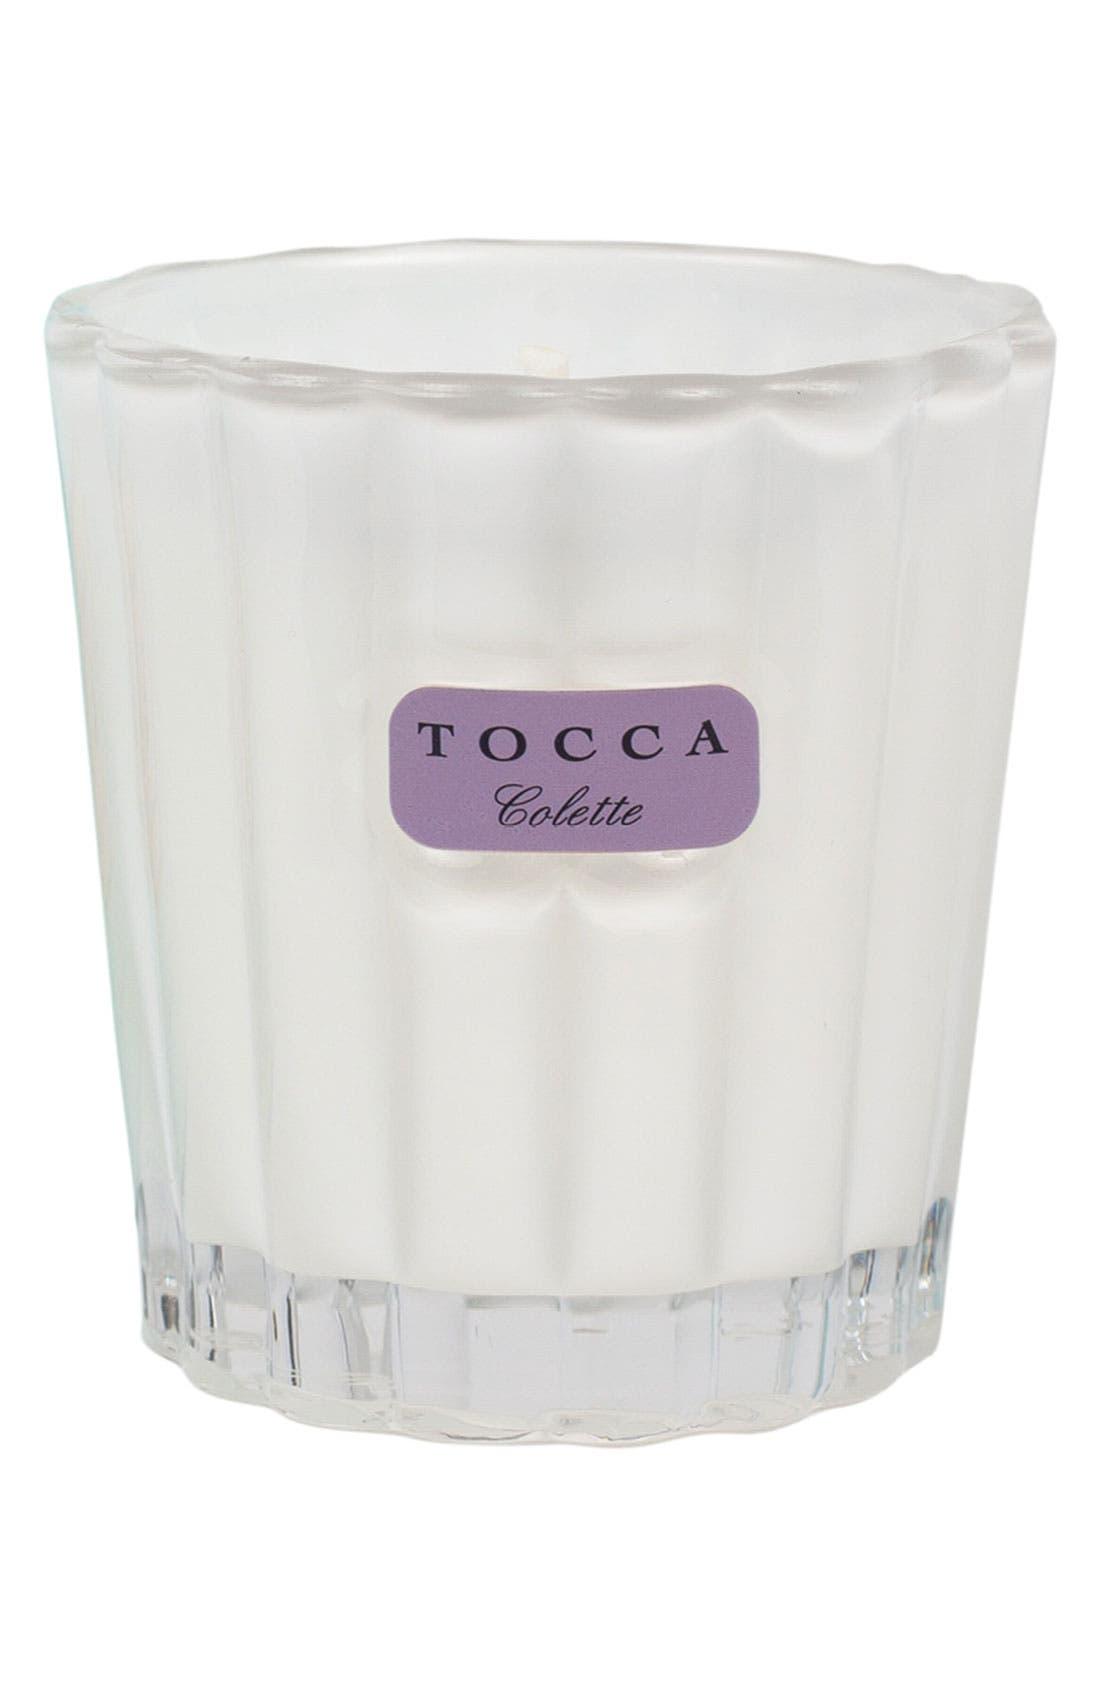 Alternate Image 1 Selected - TOCCA 'Colette' Candelina